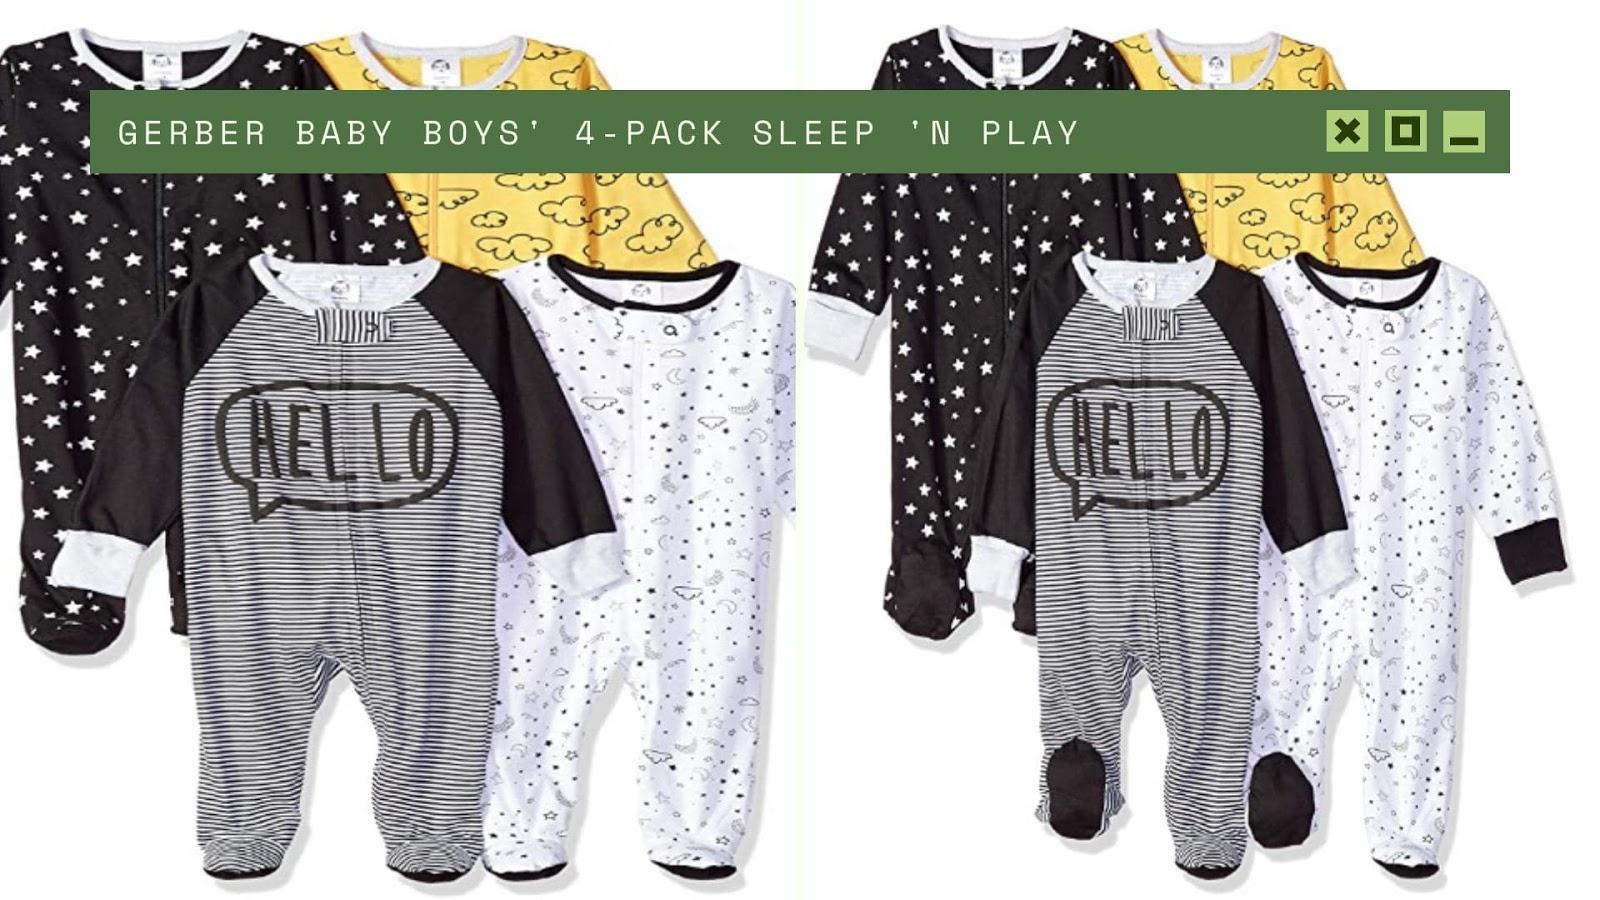 Shopping for newborn baby boy GERBER 4-Pack Sleep